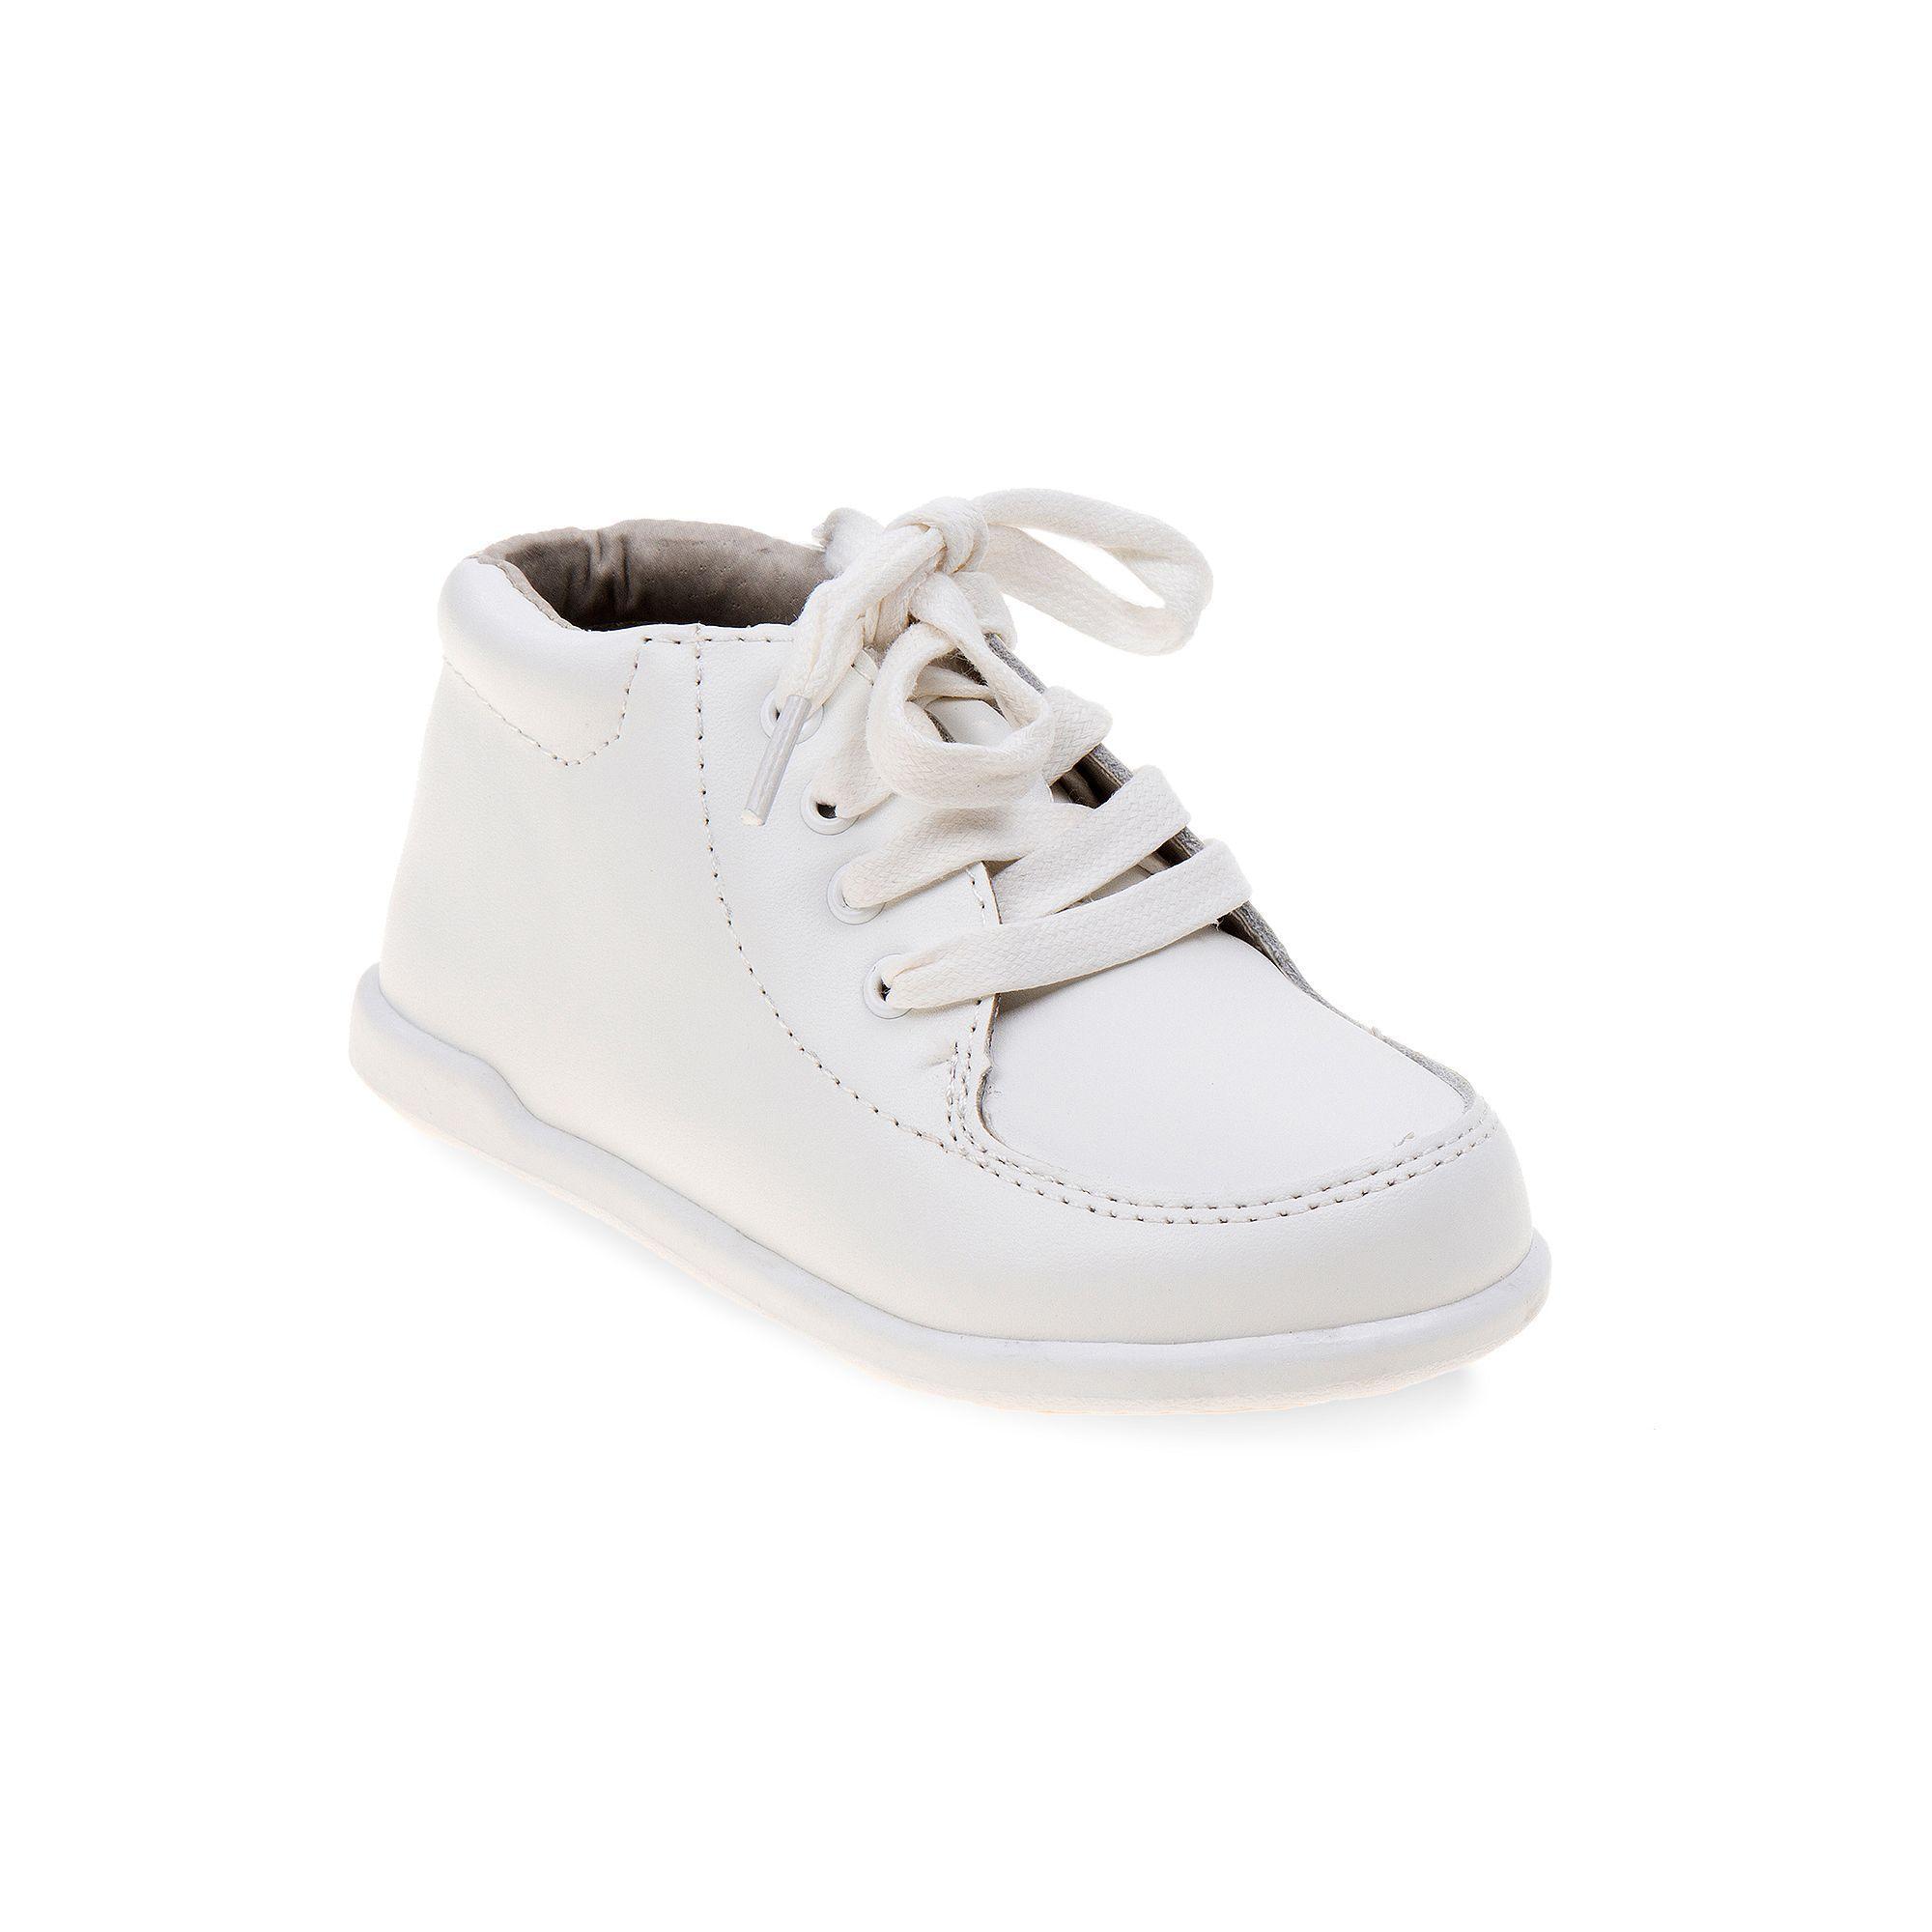 Smart Step Baby Toddler Walking Shoes Kids Uni Size 8 T